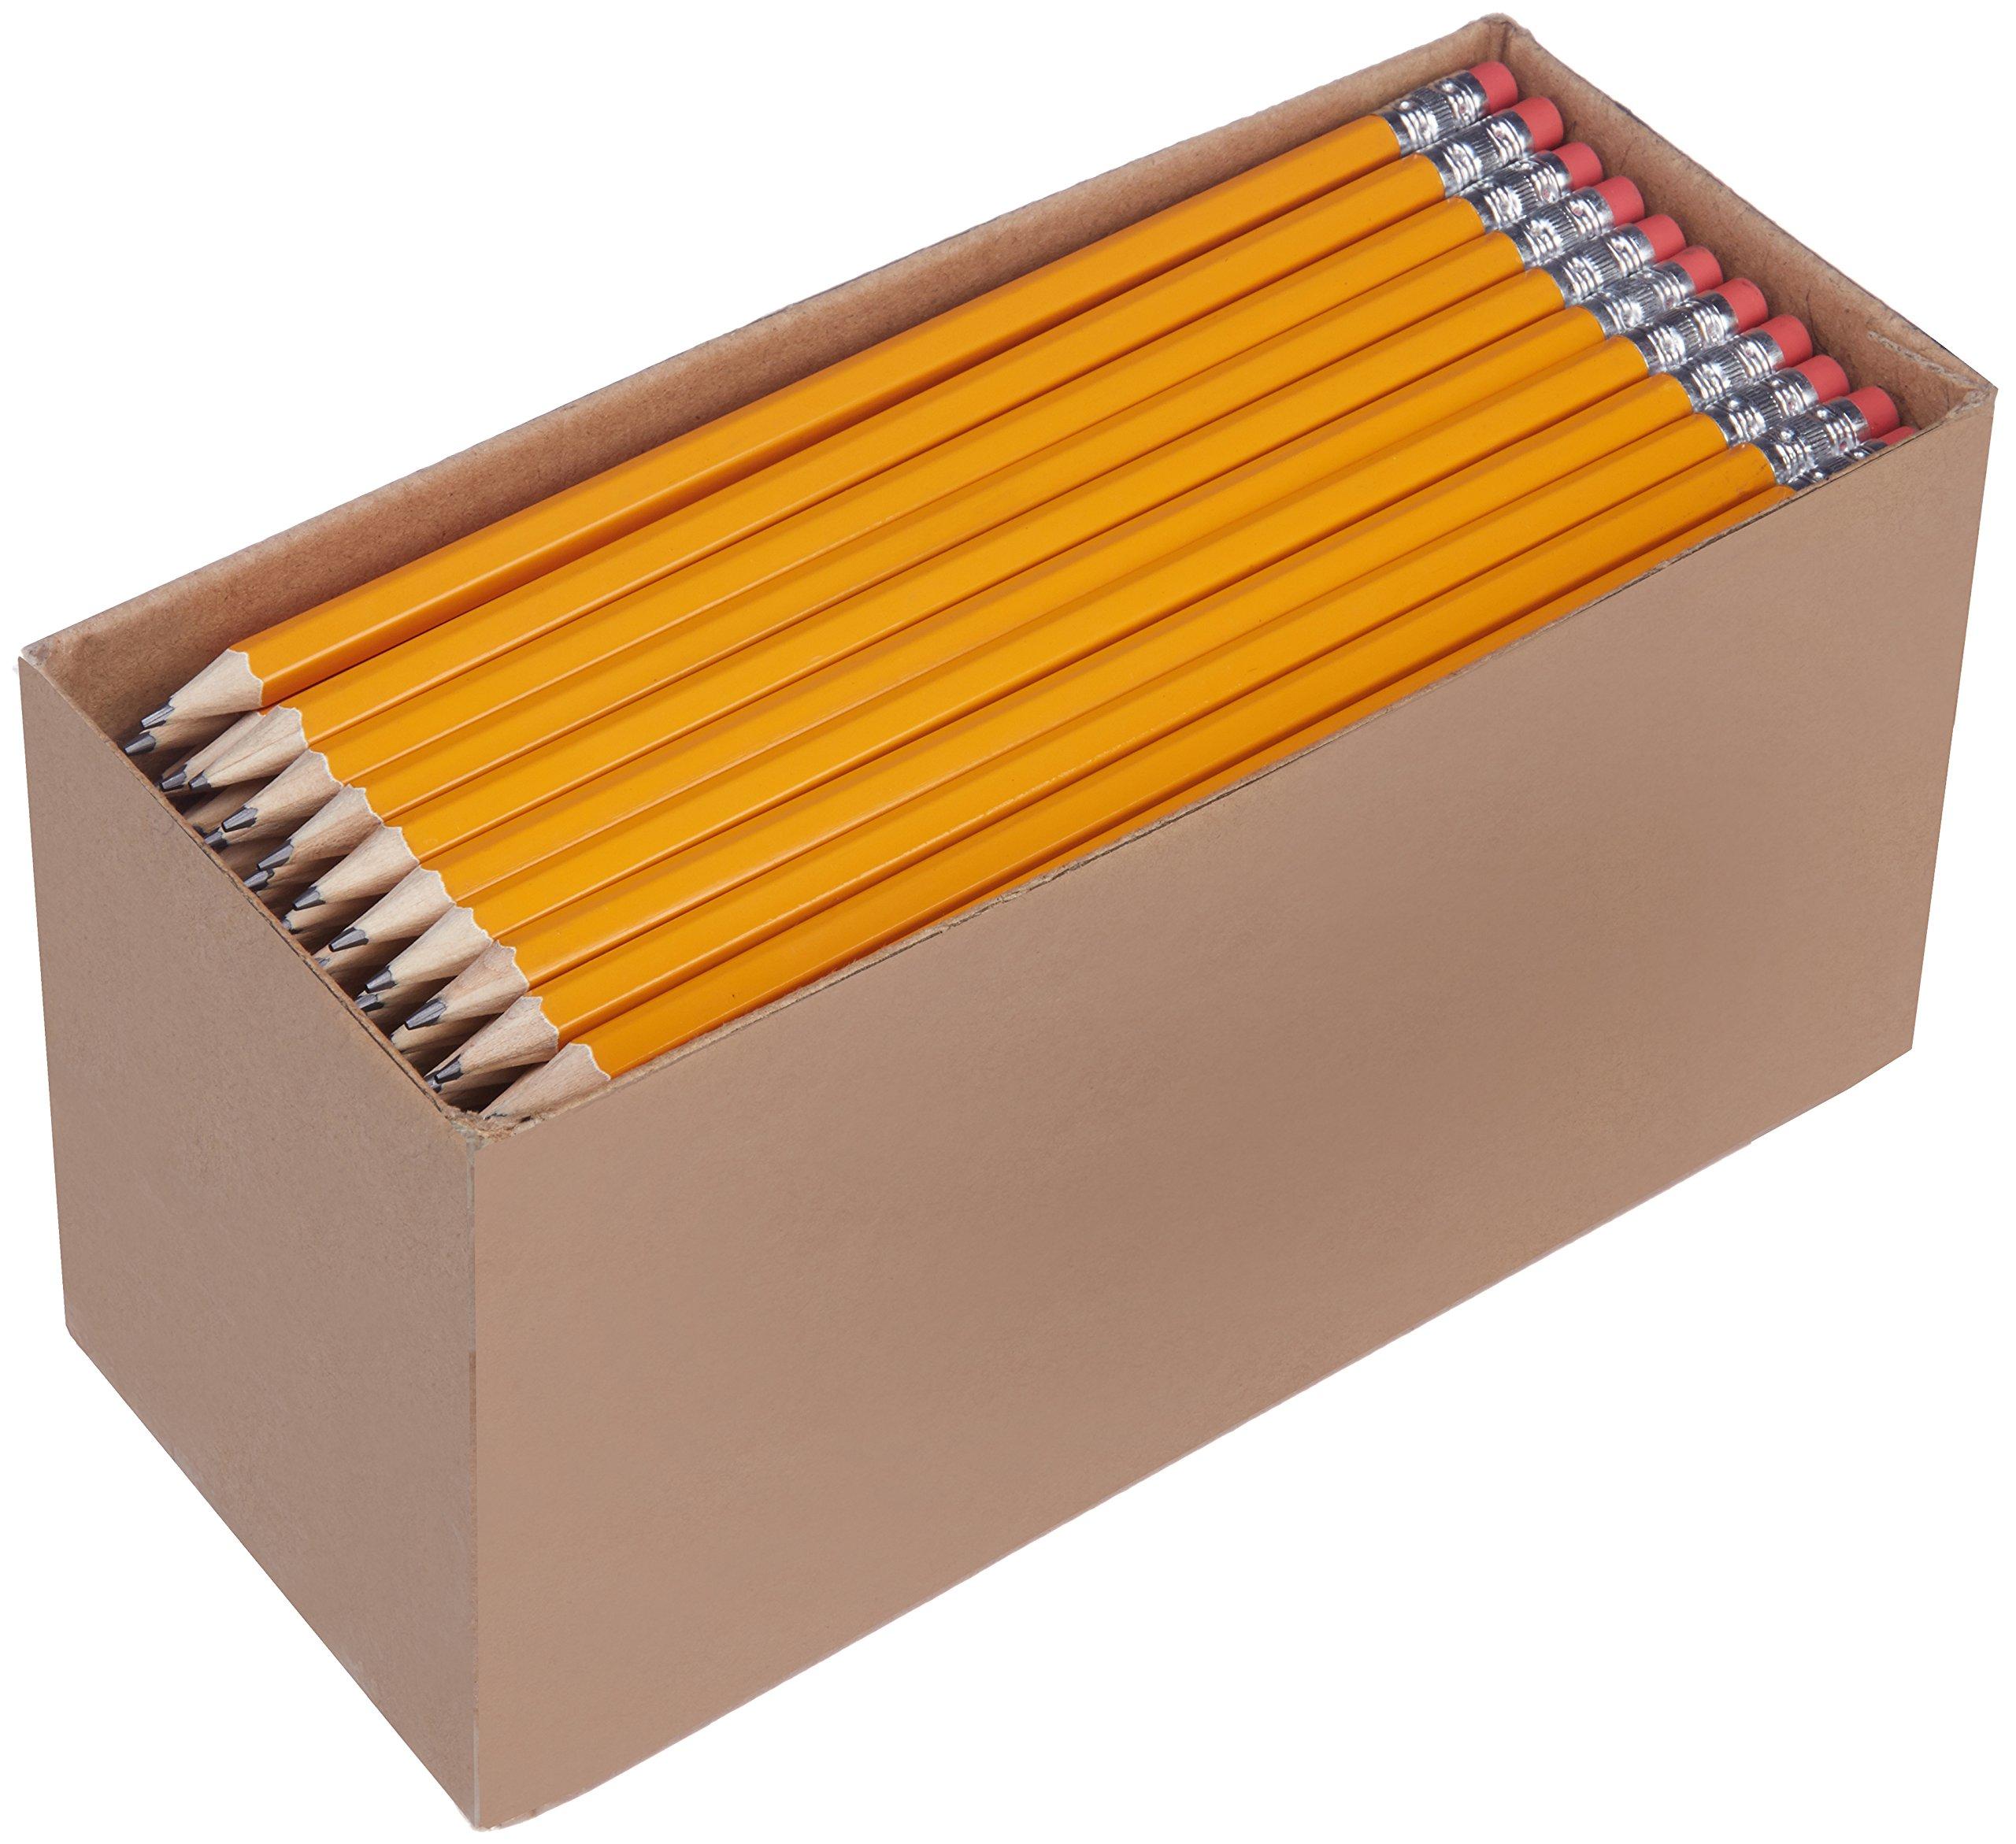 AmazonBasics Pre-sharpened Wood Cased #2 HB Pencils, 150 Pack by AmazonBasics